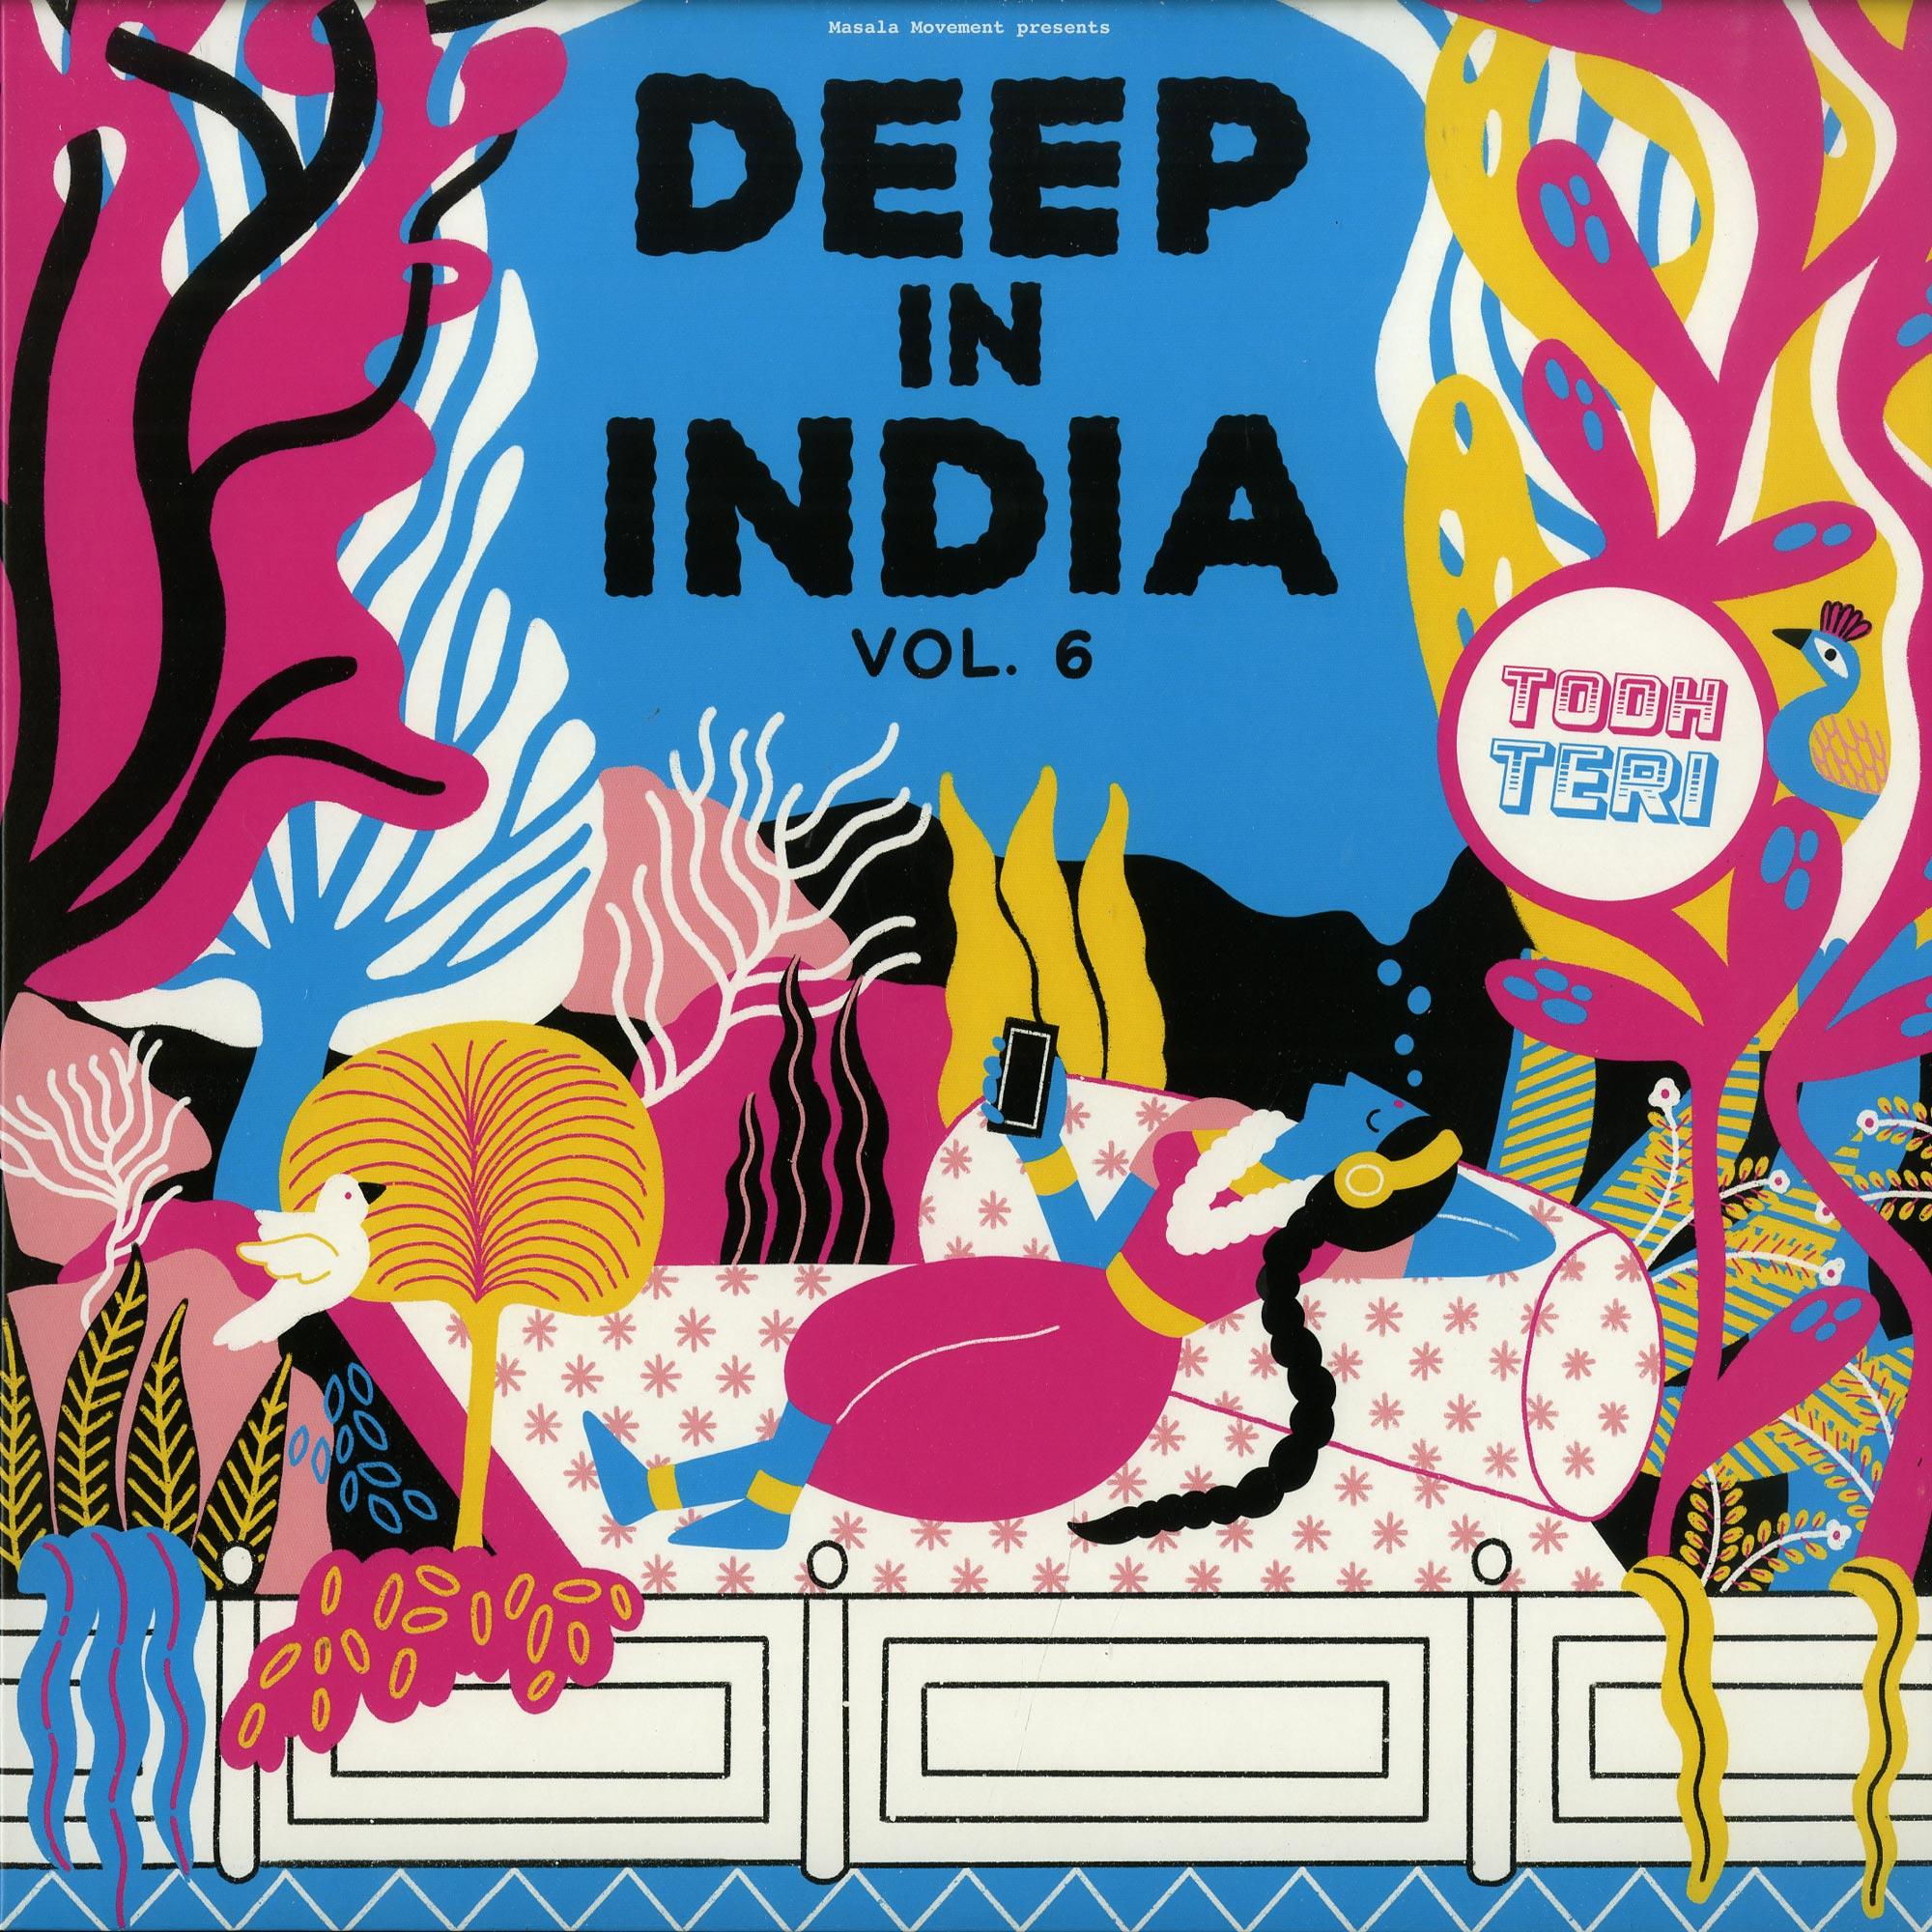 Todh Teri - DEEP IN INDIA VOL.6